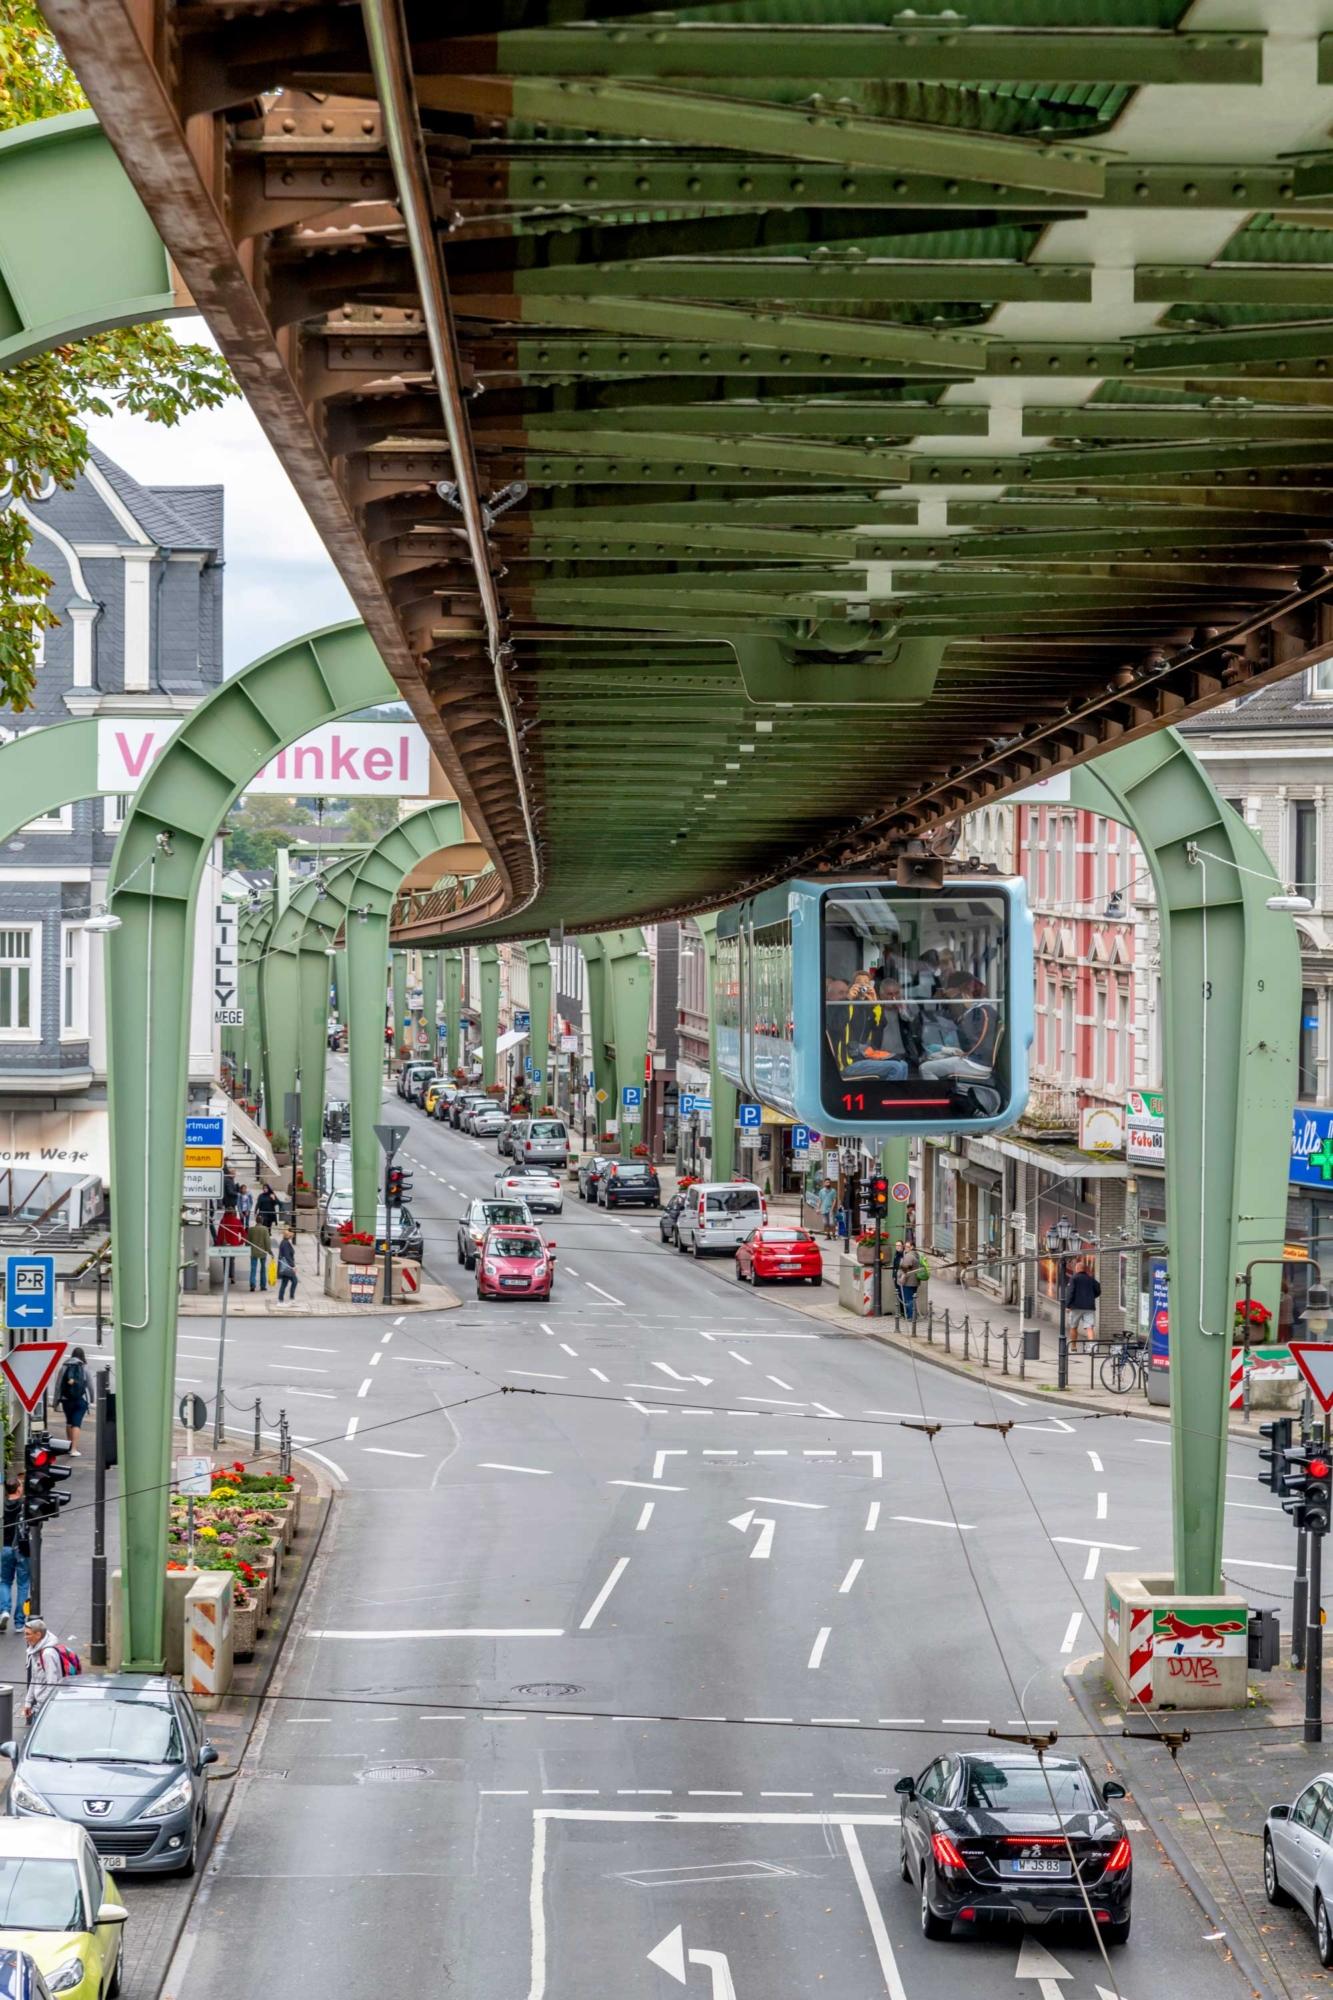 Wuppertal Schwebebahn Monorail, Germany 190905wc859605